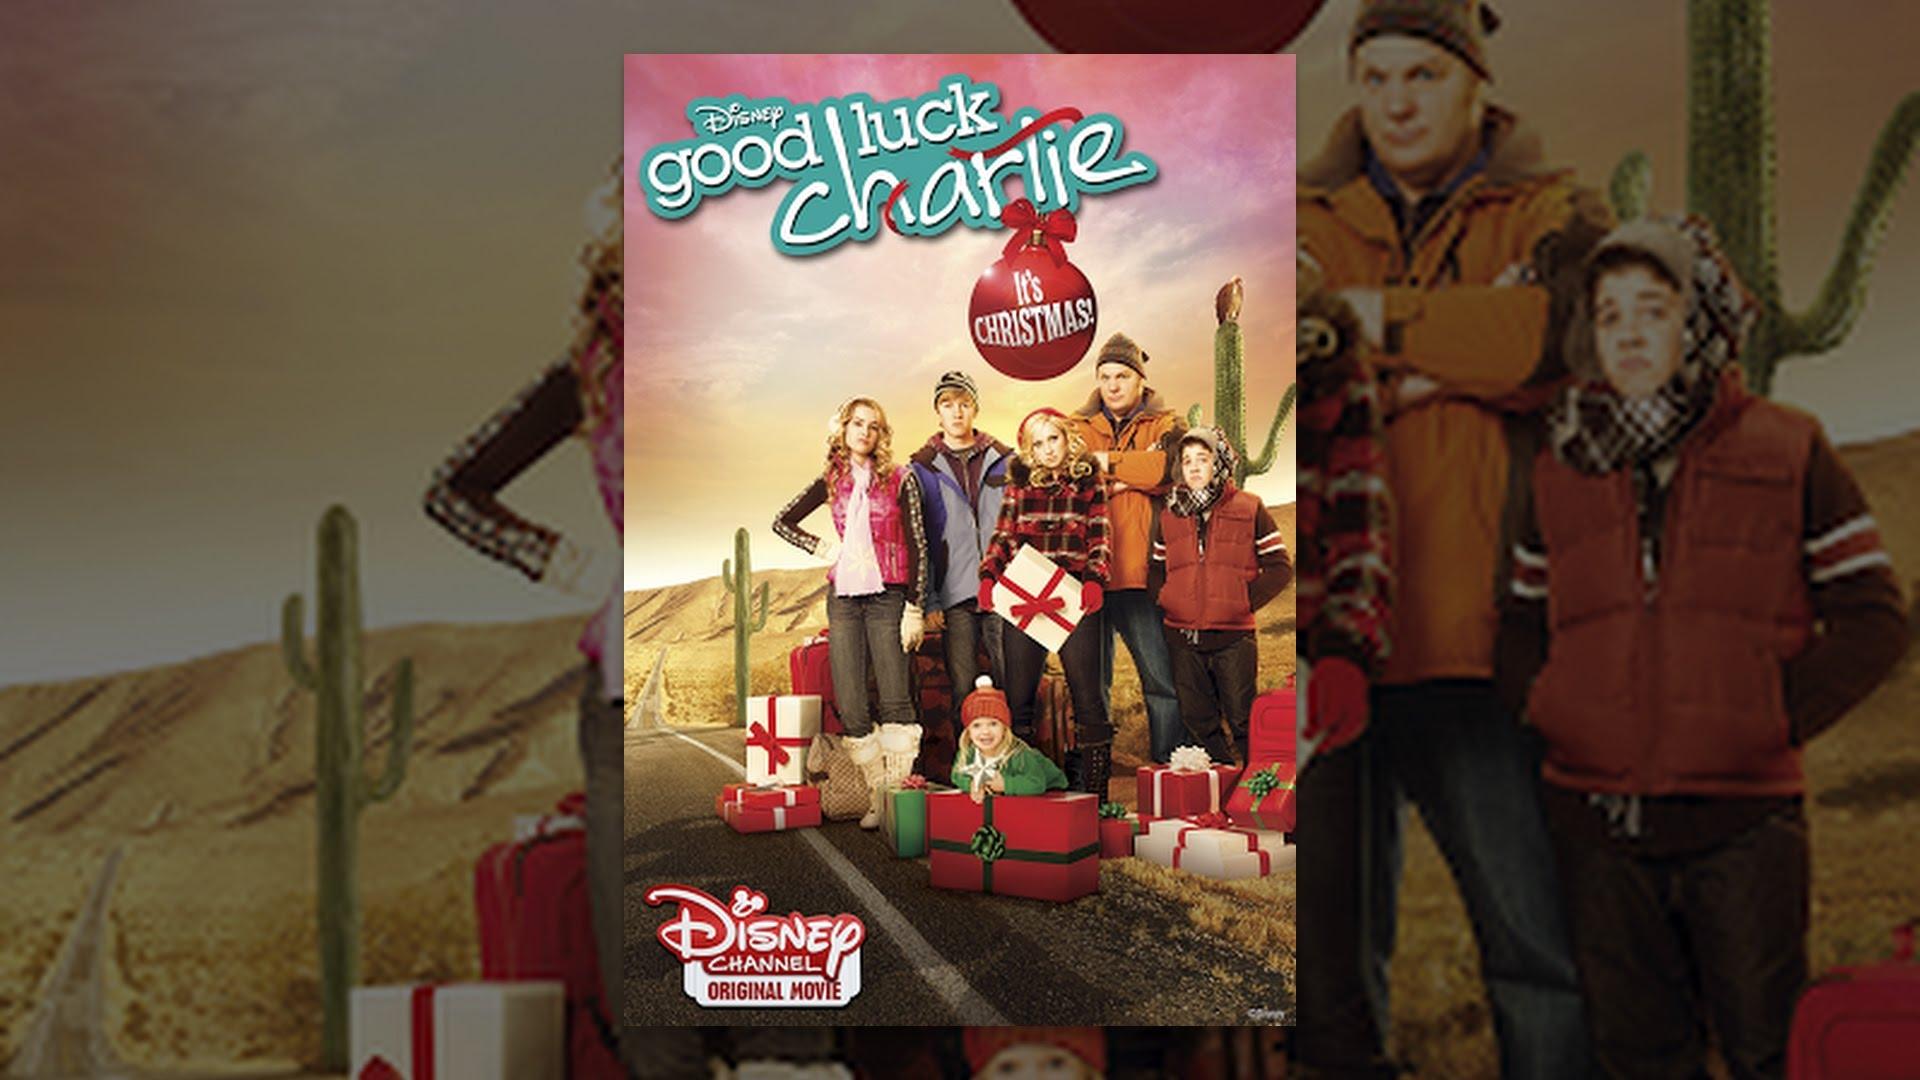 Good Luck Charlie, It's Christmas